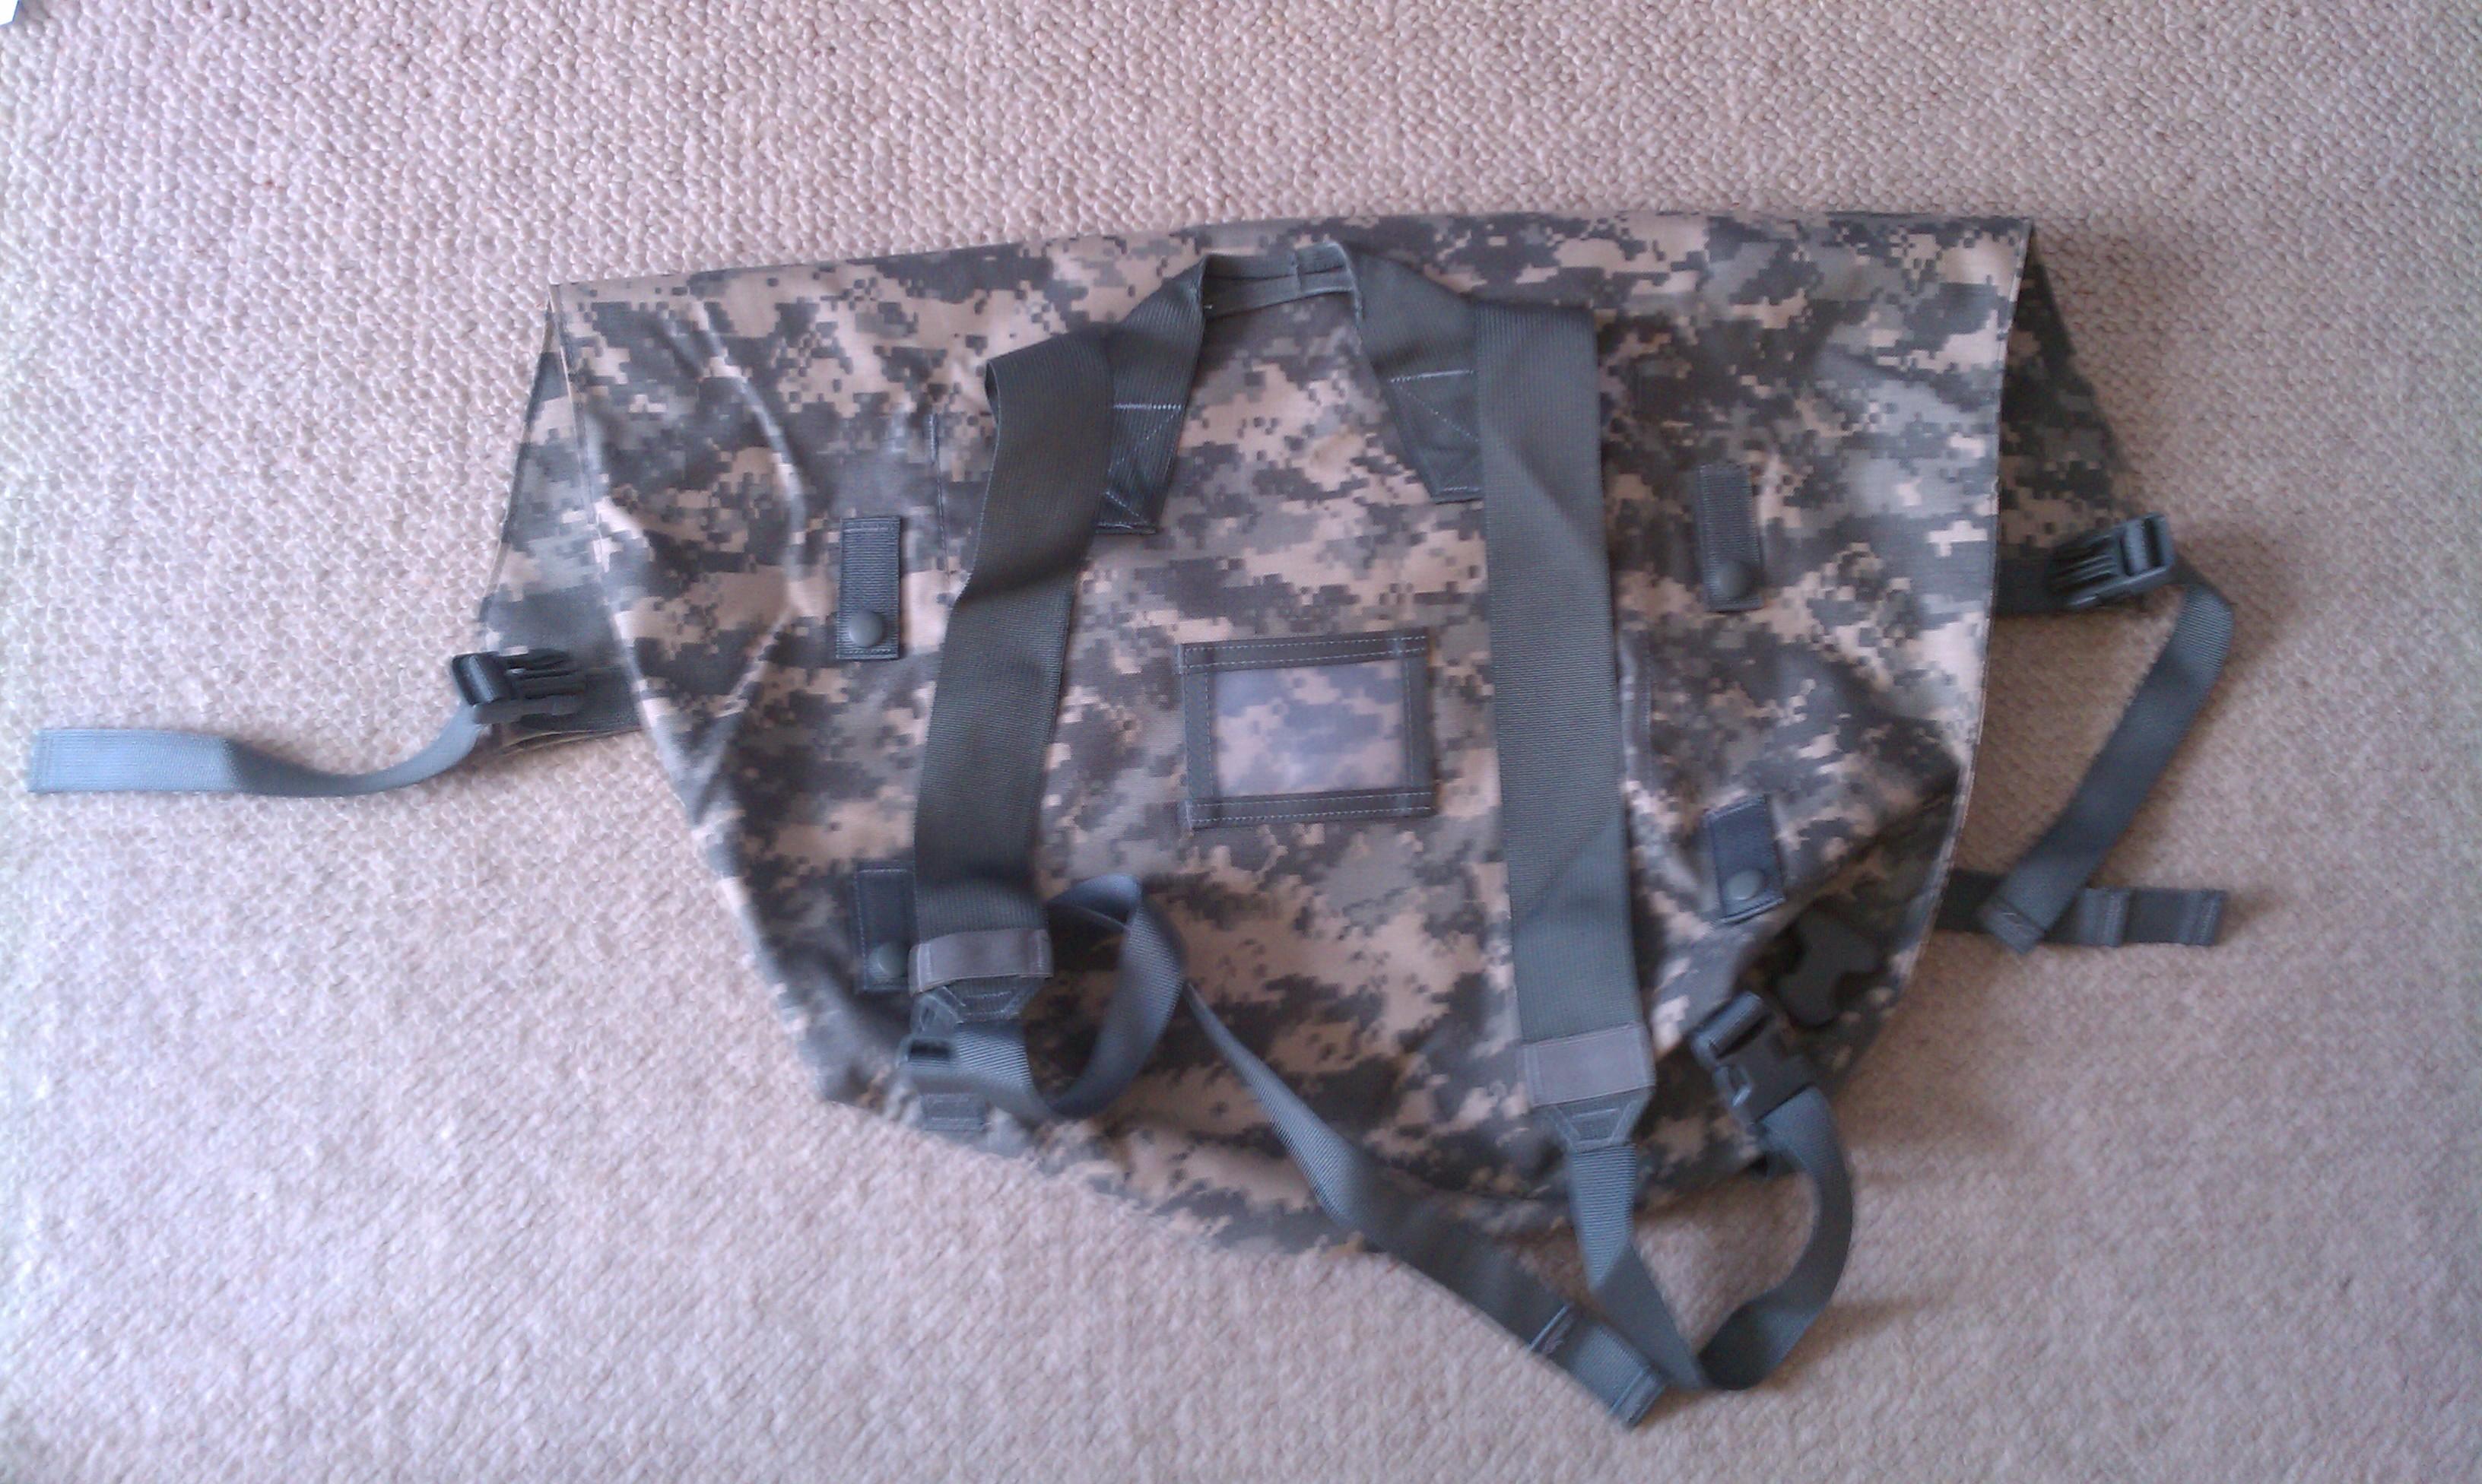 Bag for Chem Suit